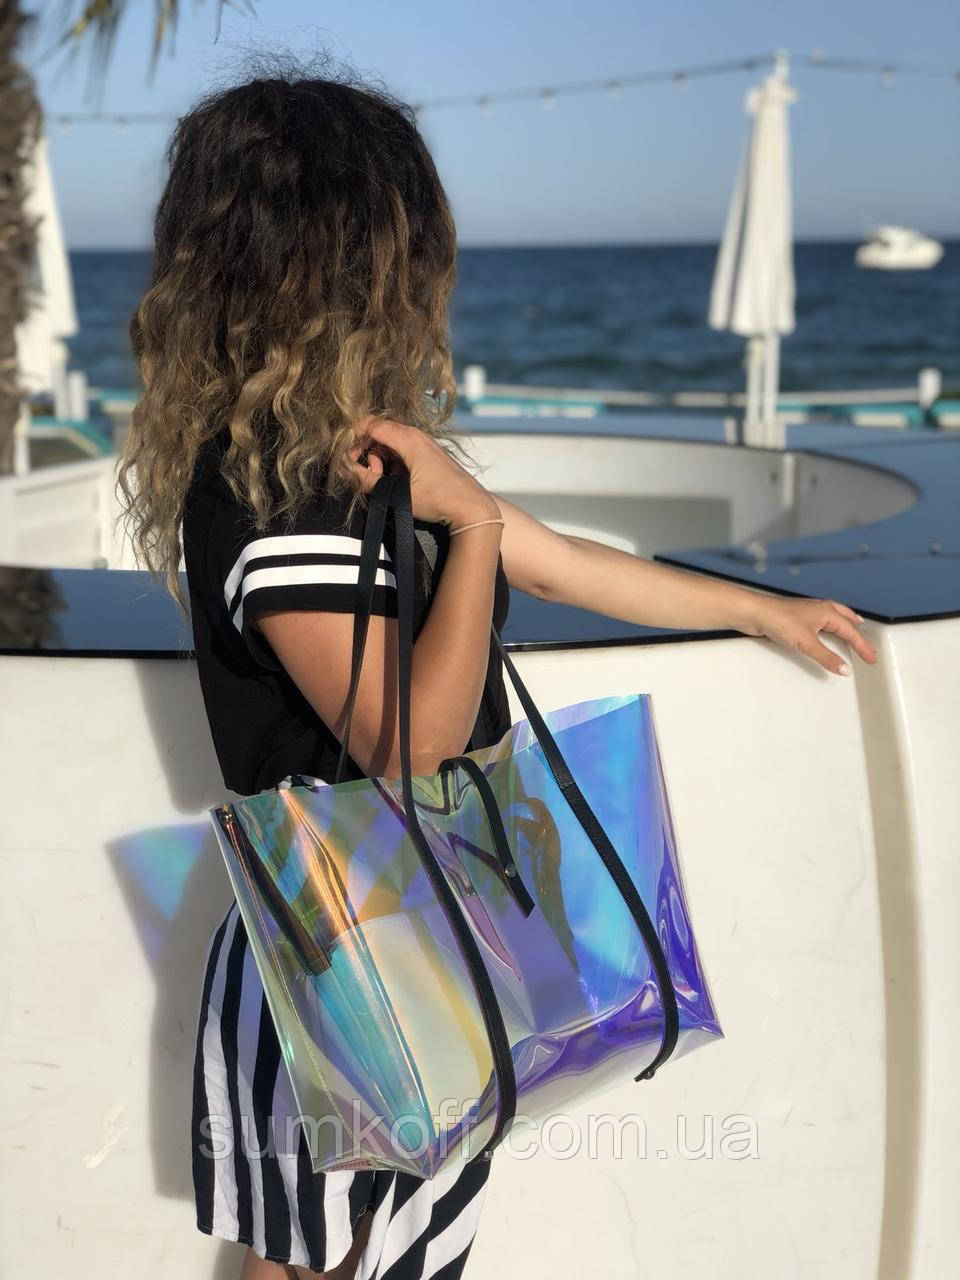 Пляжна сумка! Велика жіноча силіконова сумка з клатчем 56501 перламутрова напівпрозора на плече